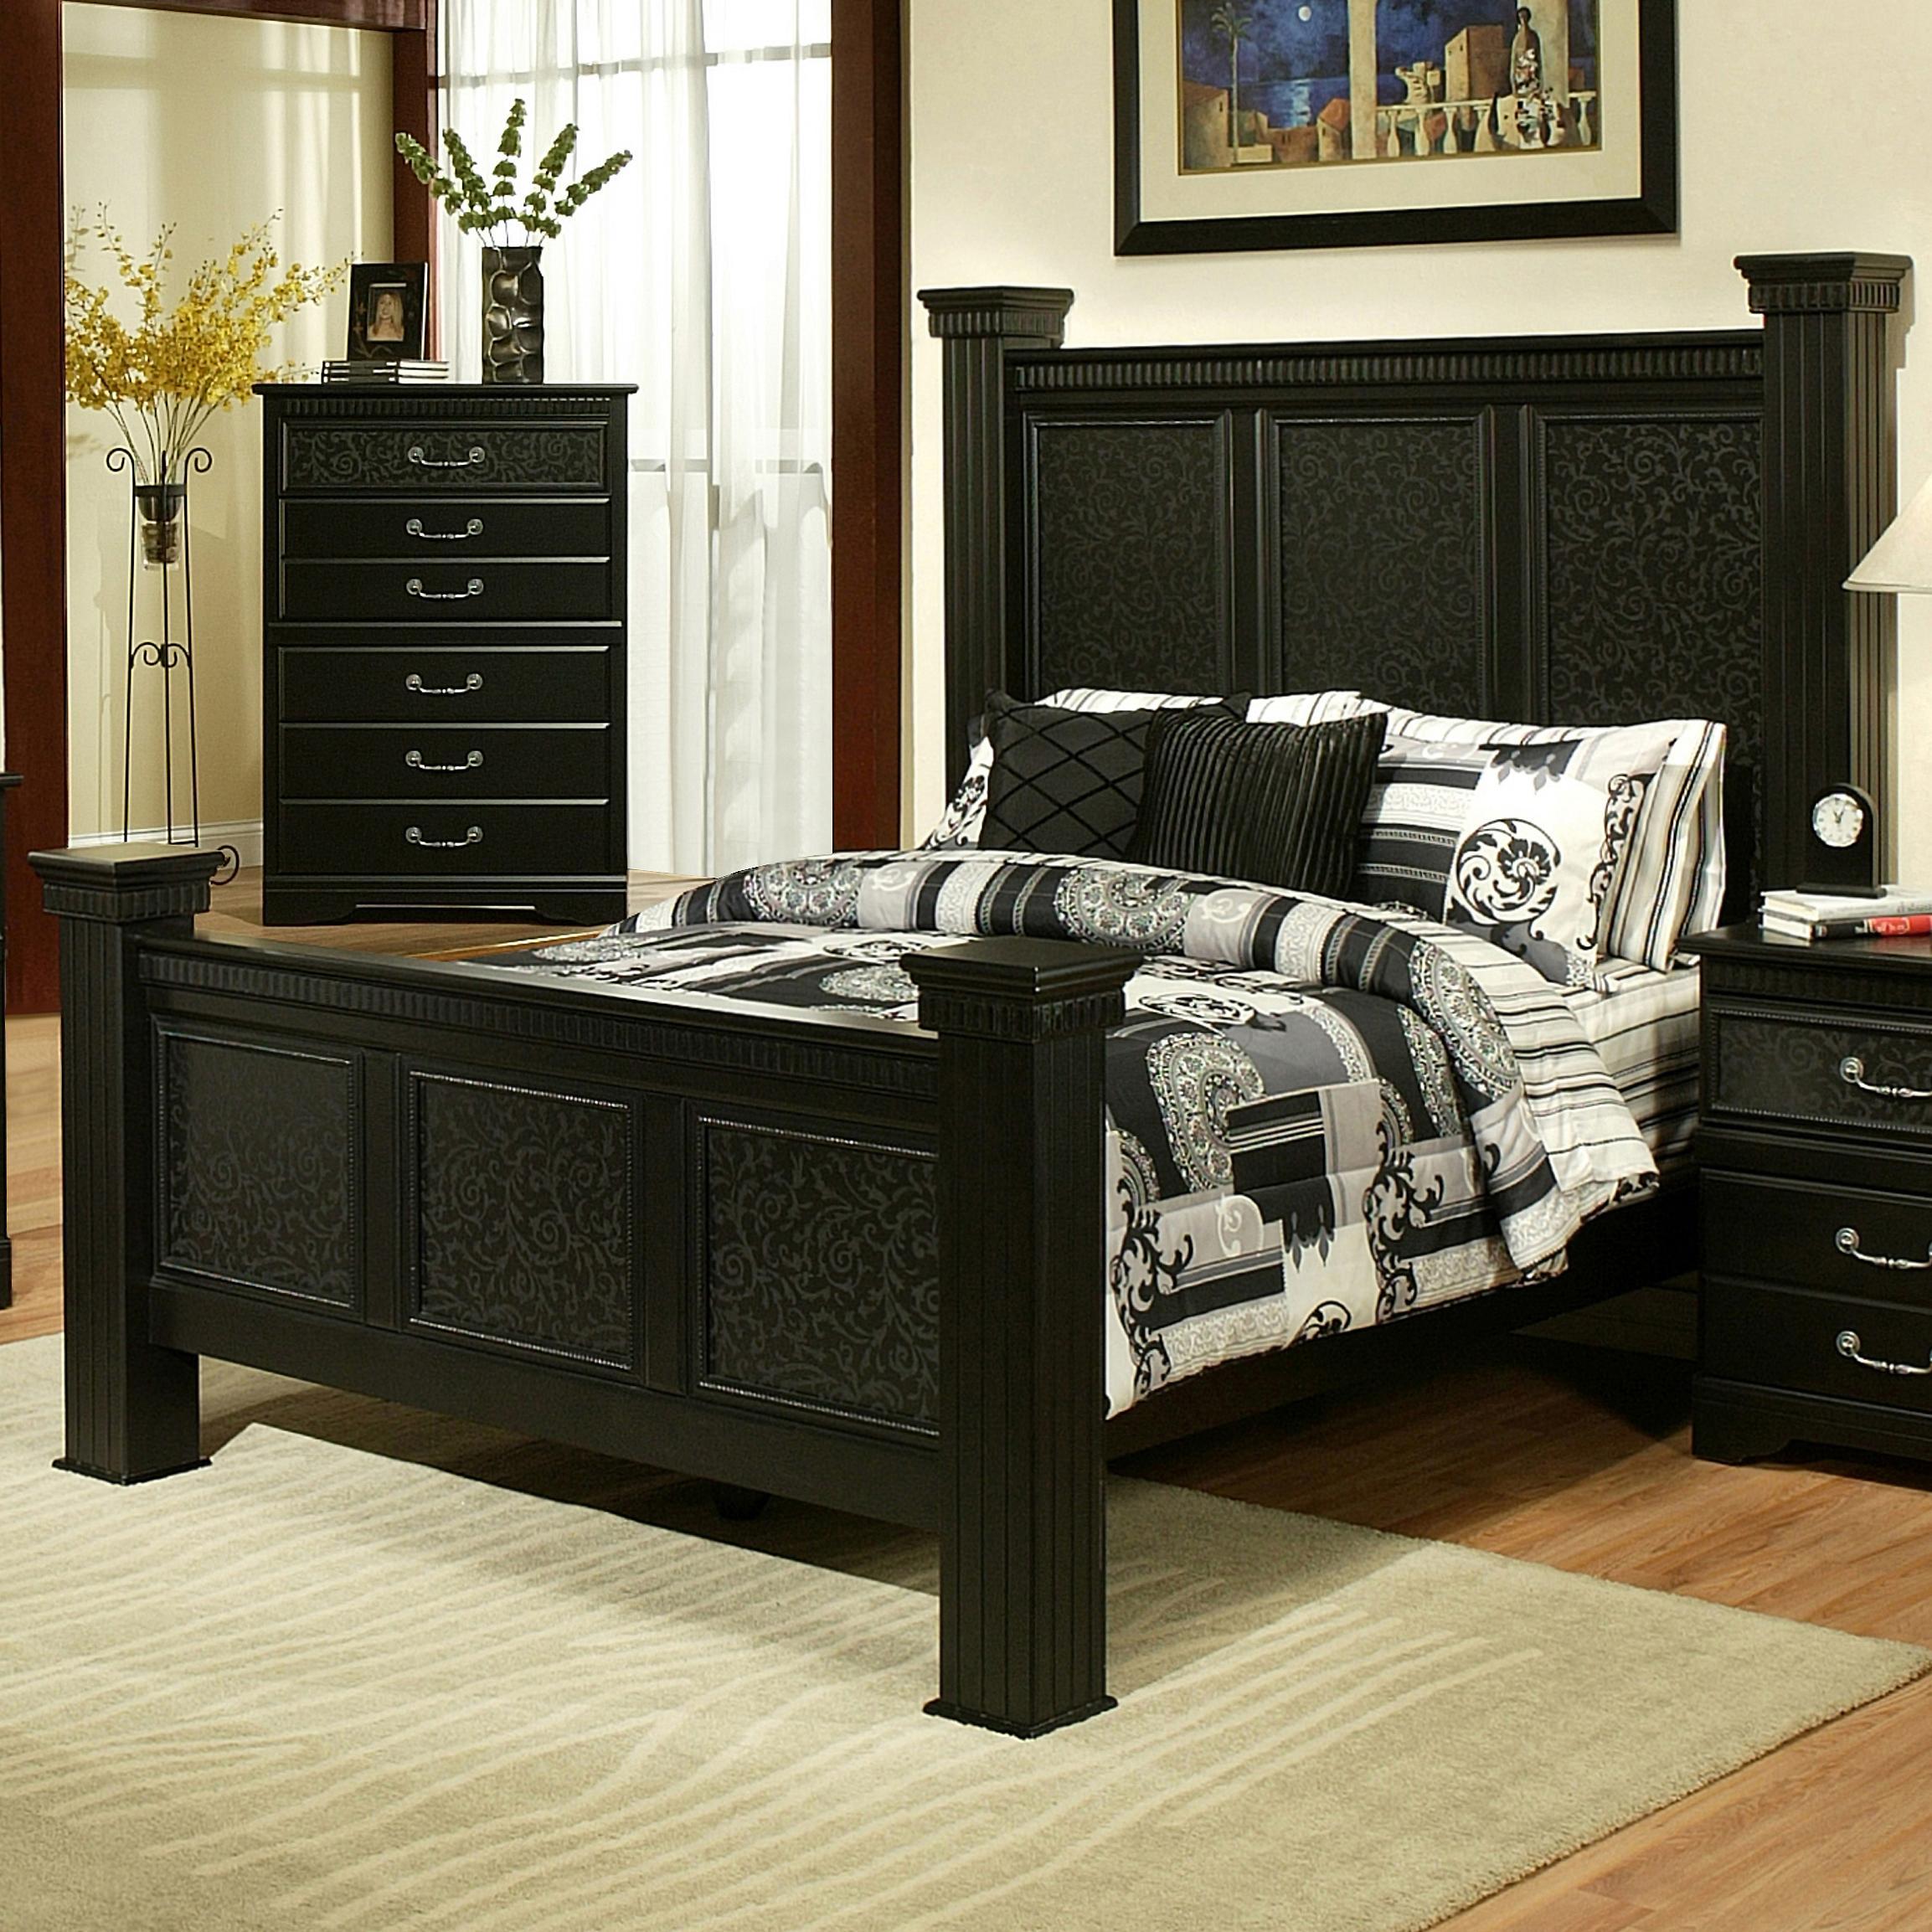 Sandberg Furniture Granada  Queen Estate Bed - Item Number: 344A